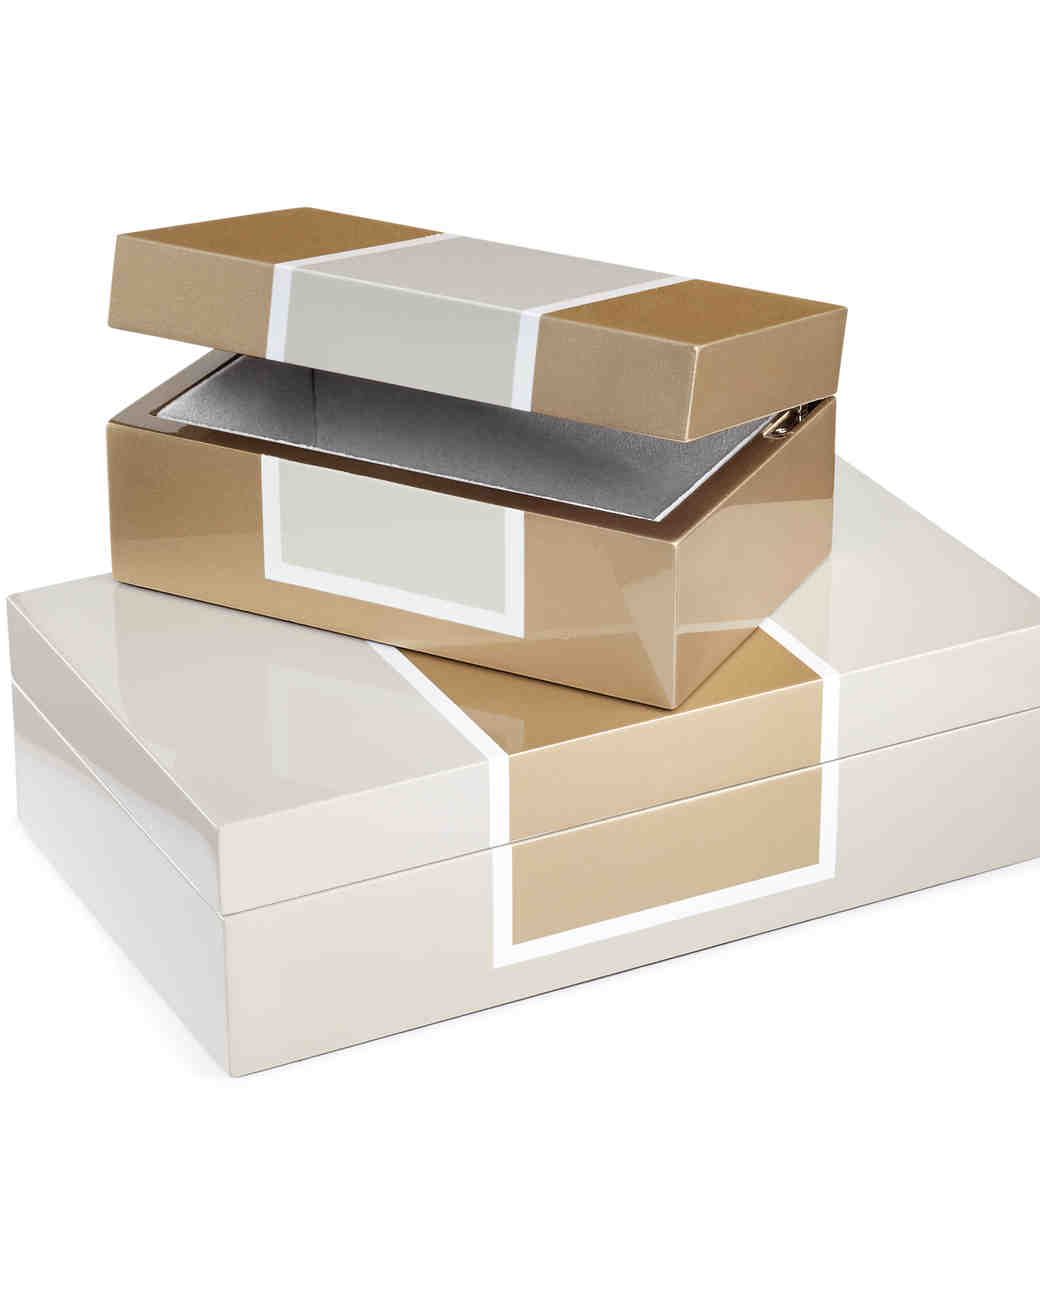 msmacys-mothersdayshop-stylish-boxes-0315.jpg